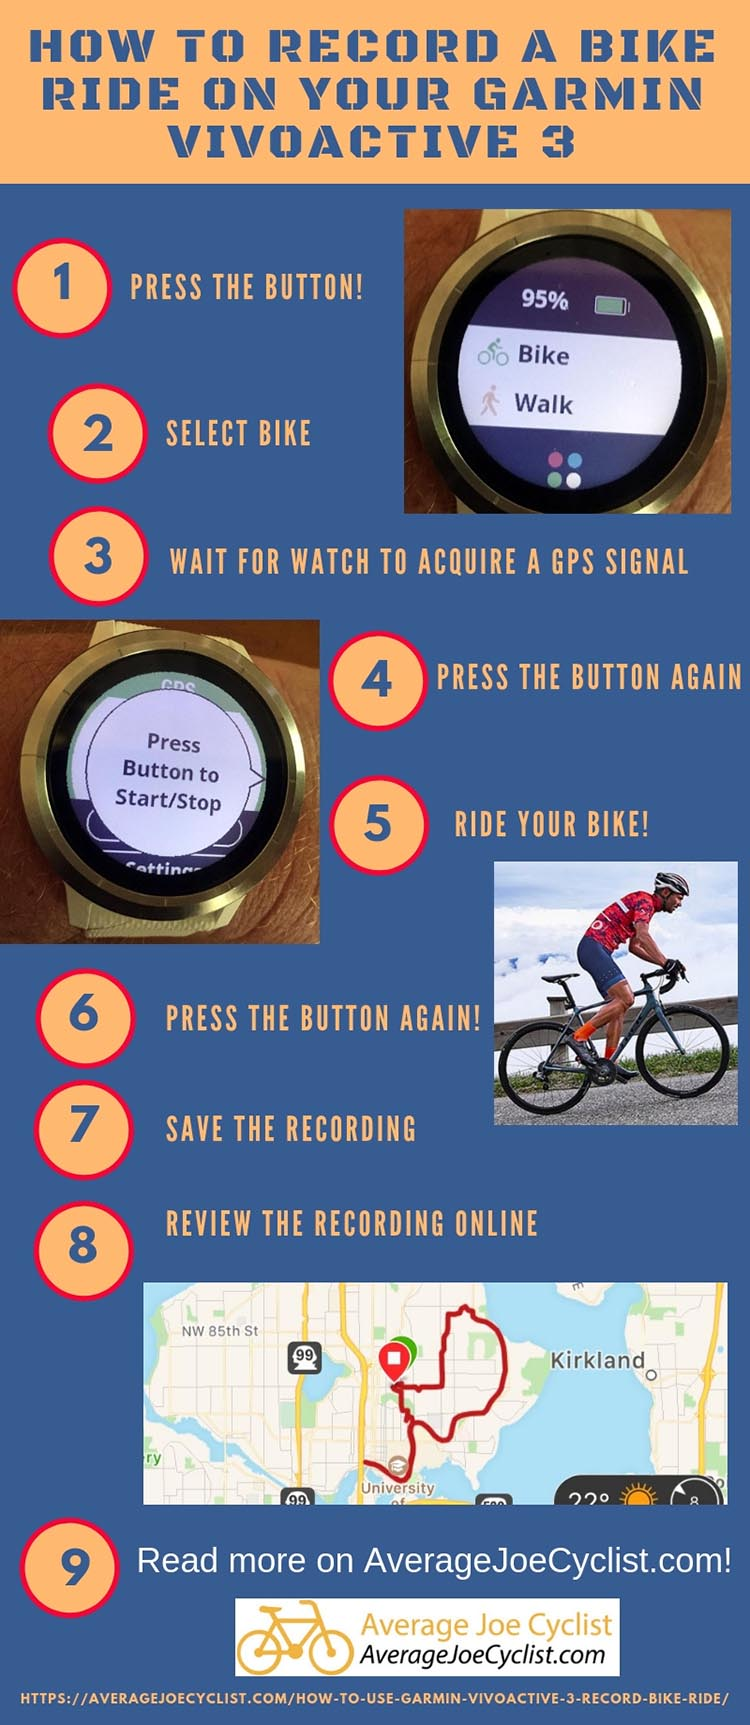 c6409bece0 How to Record a Bike Ride with a Garmin Vivoactive 3